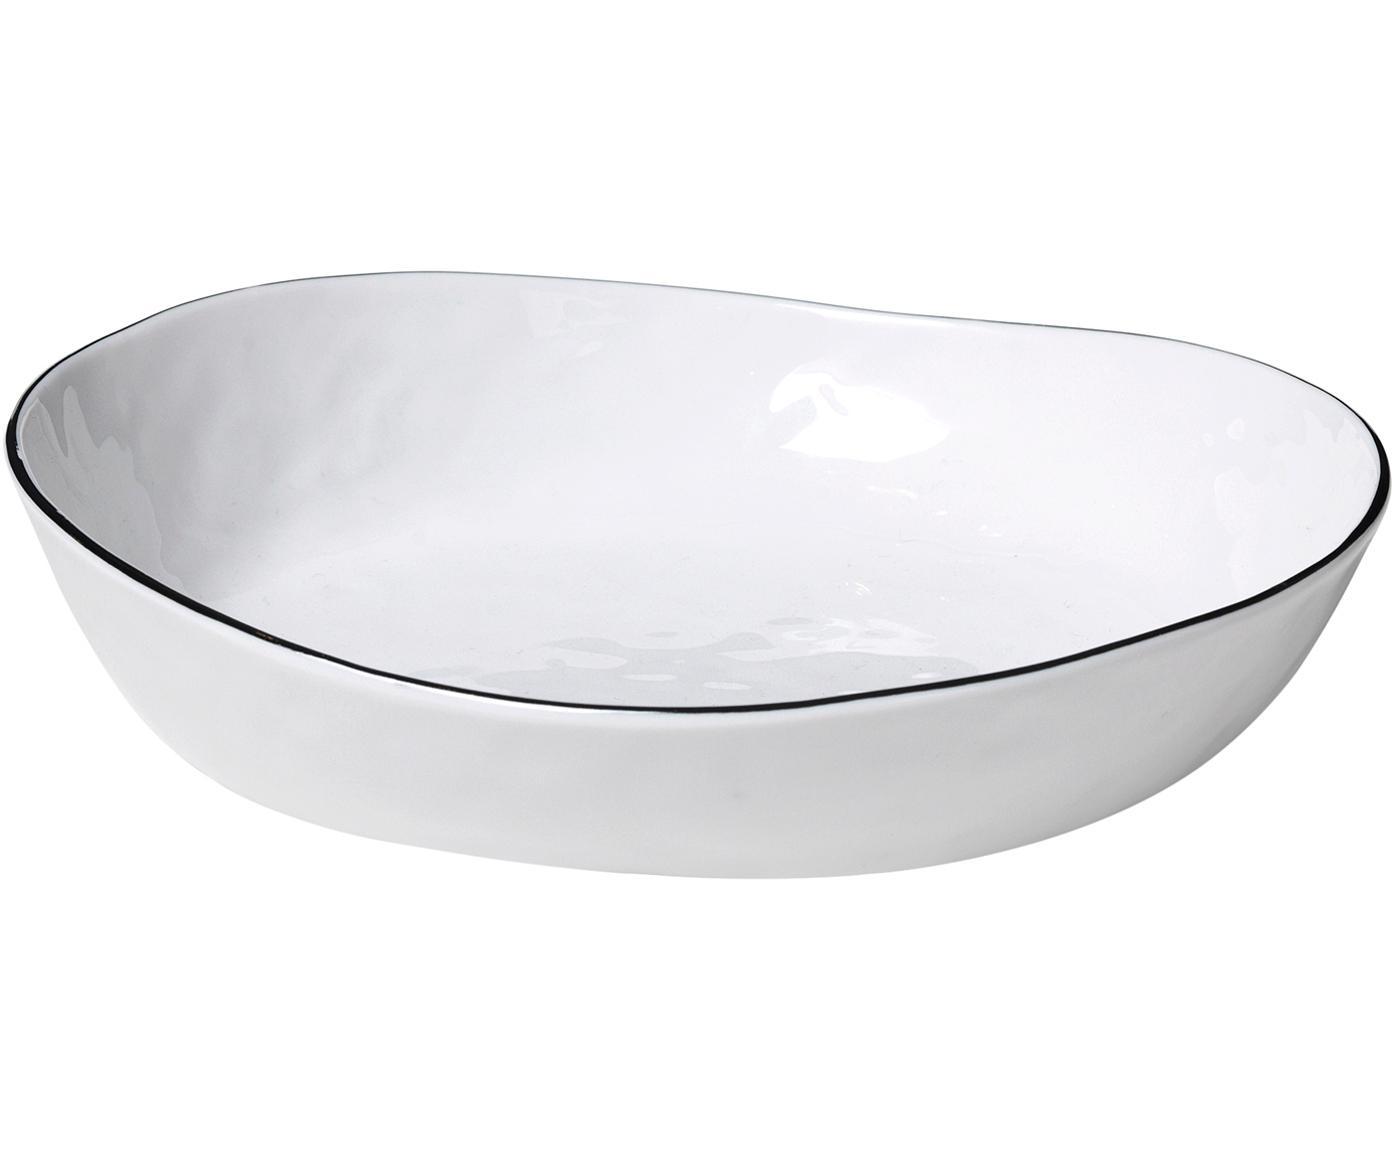 Handgemaakte schalen Salt, 2 stuks, Porselein, Gebroken wit, zwart, Ø 20 x H 4 cm